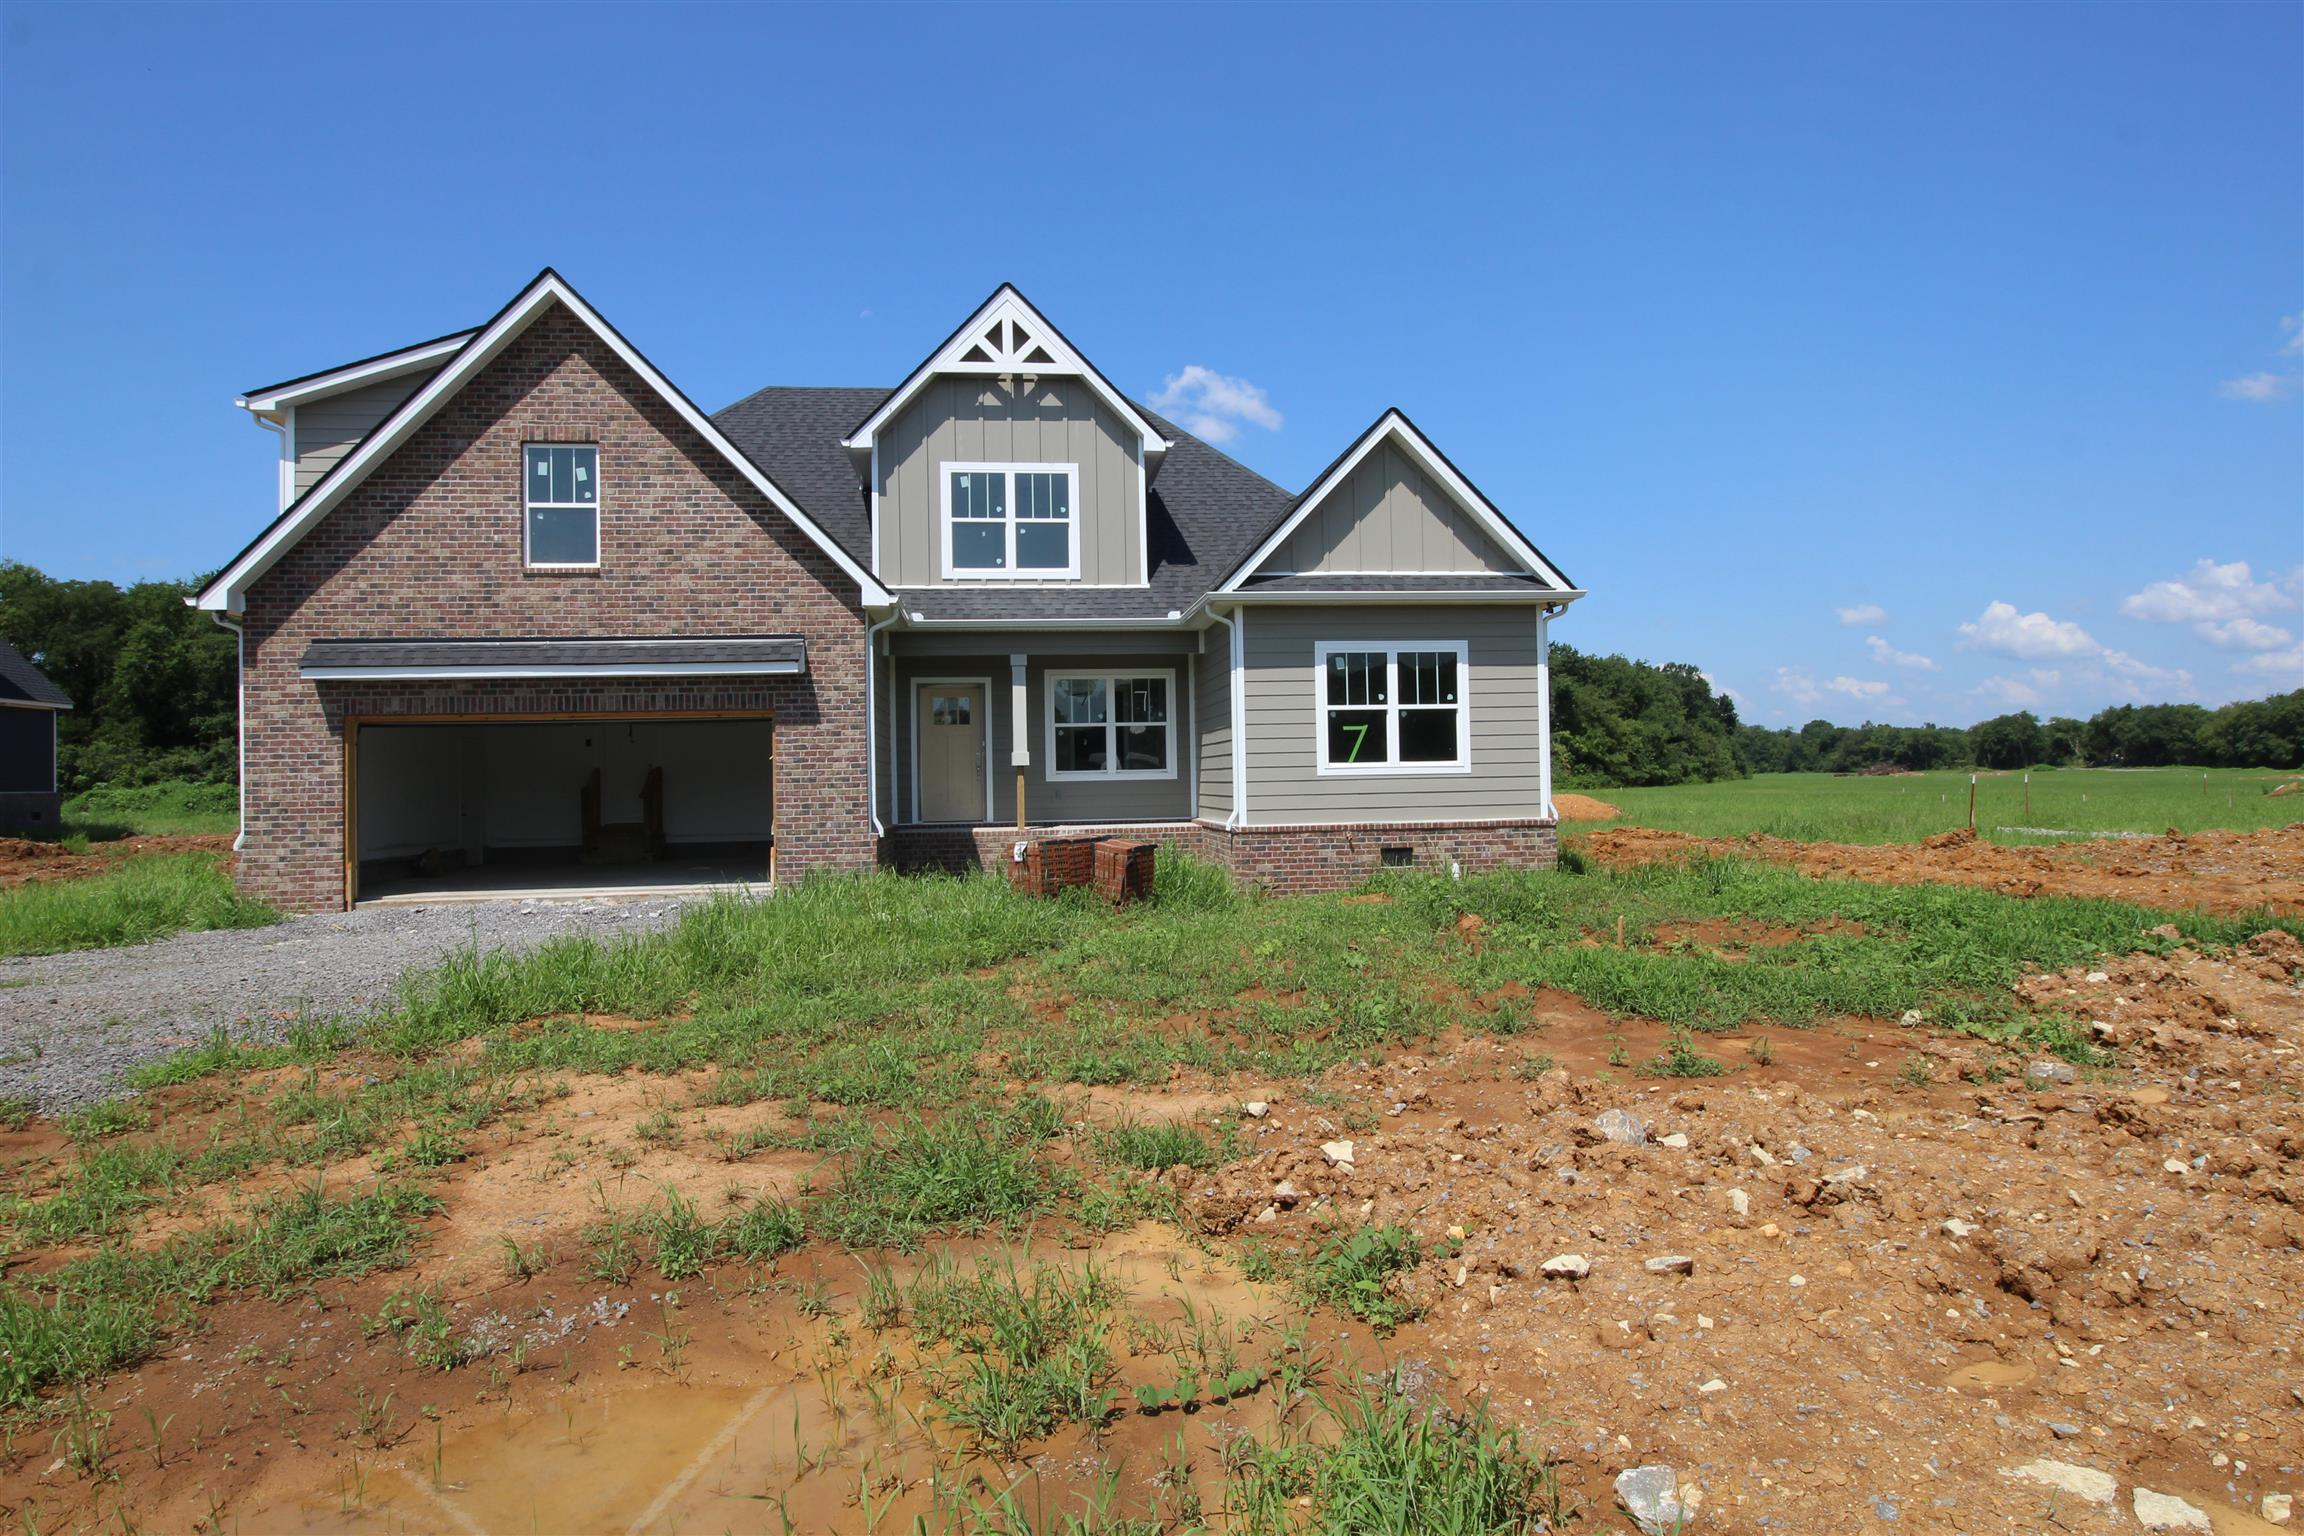 2494 Armstrong Valley Rd (Lot 7, Murfreesboro, TN 37128 - Murfreesboro, TN real estate listing